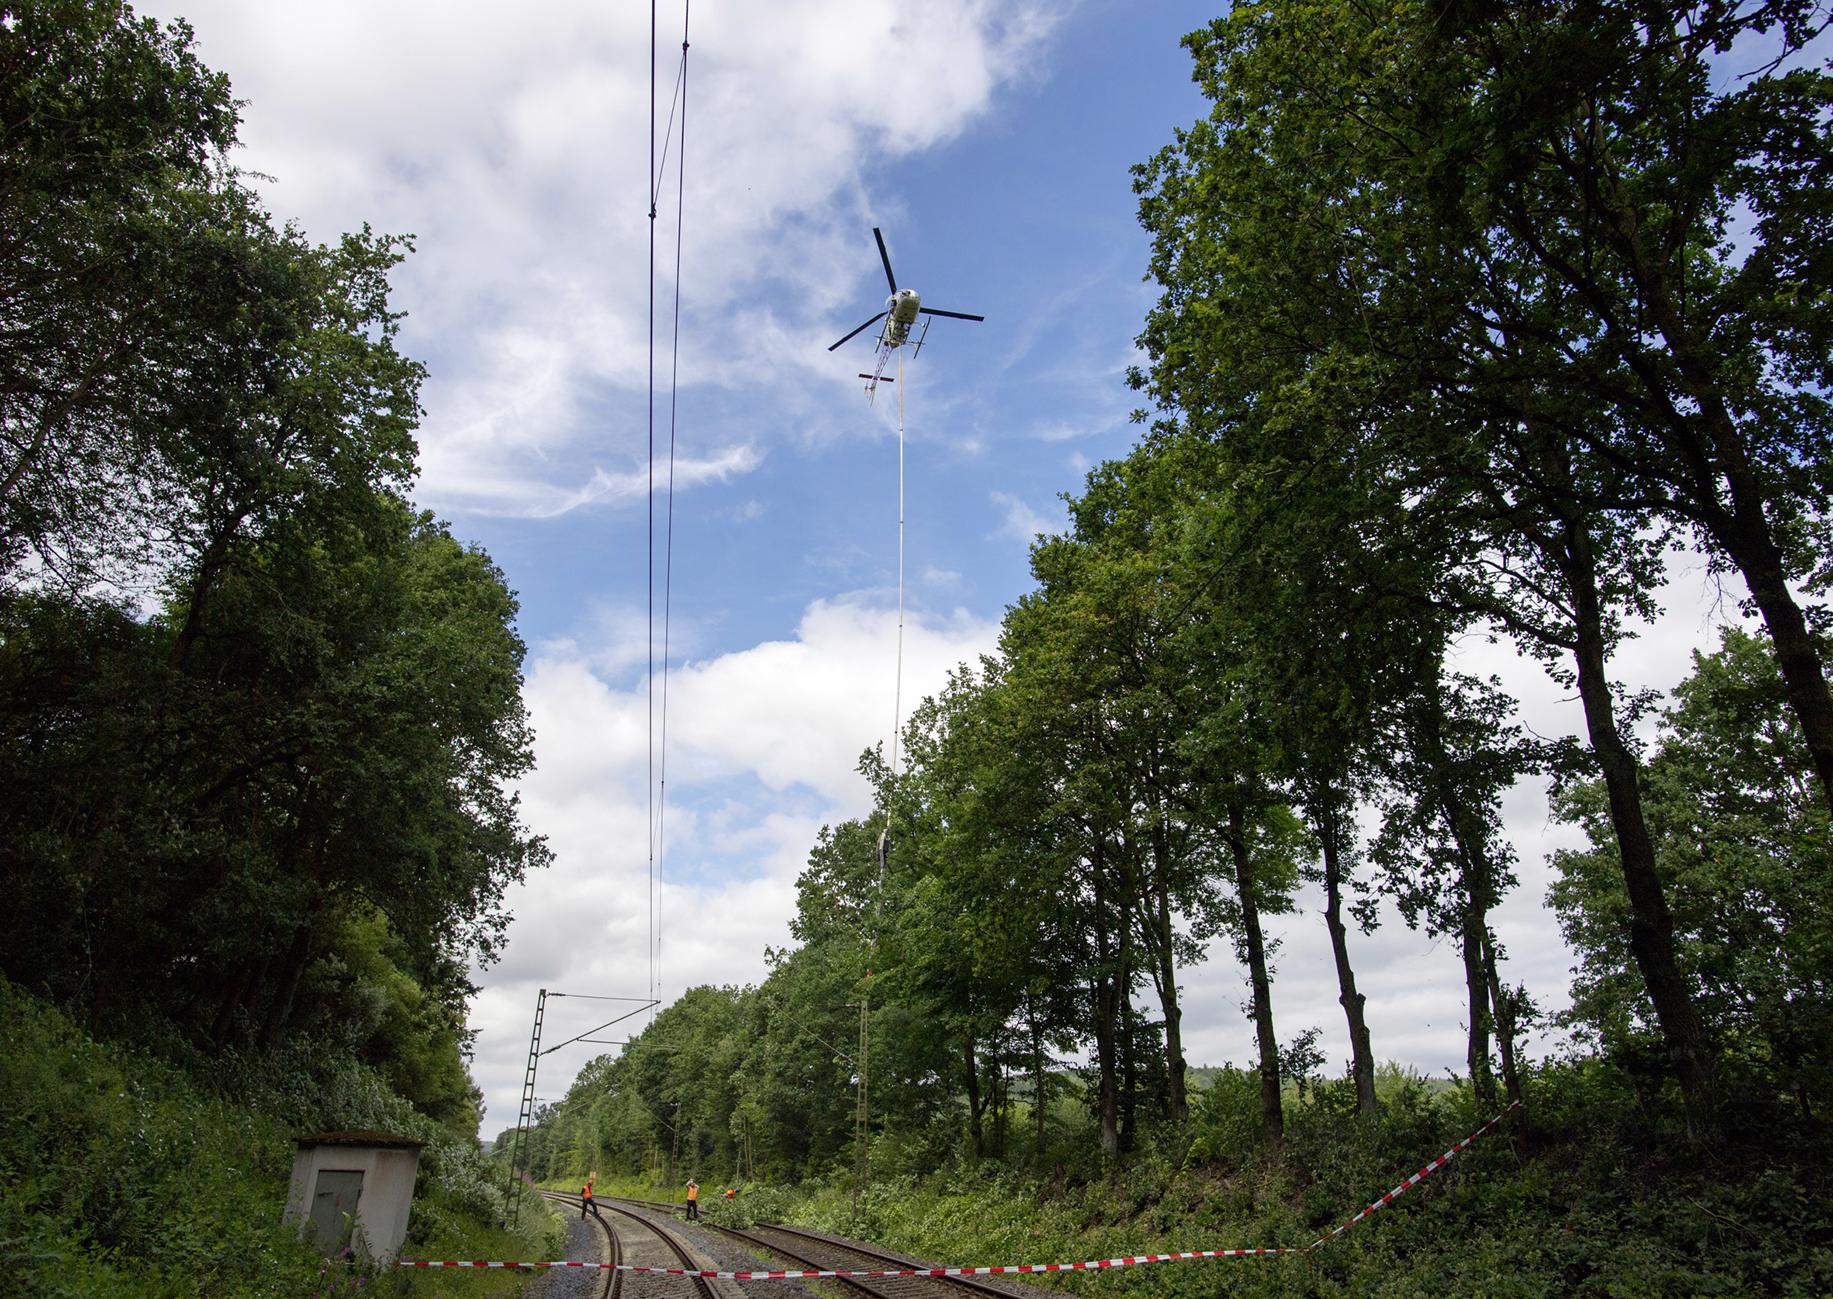 Helikopter mit einer meterlange Säge über Bahngleisen